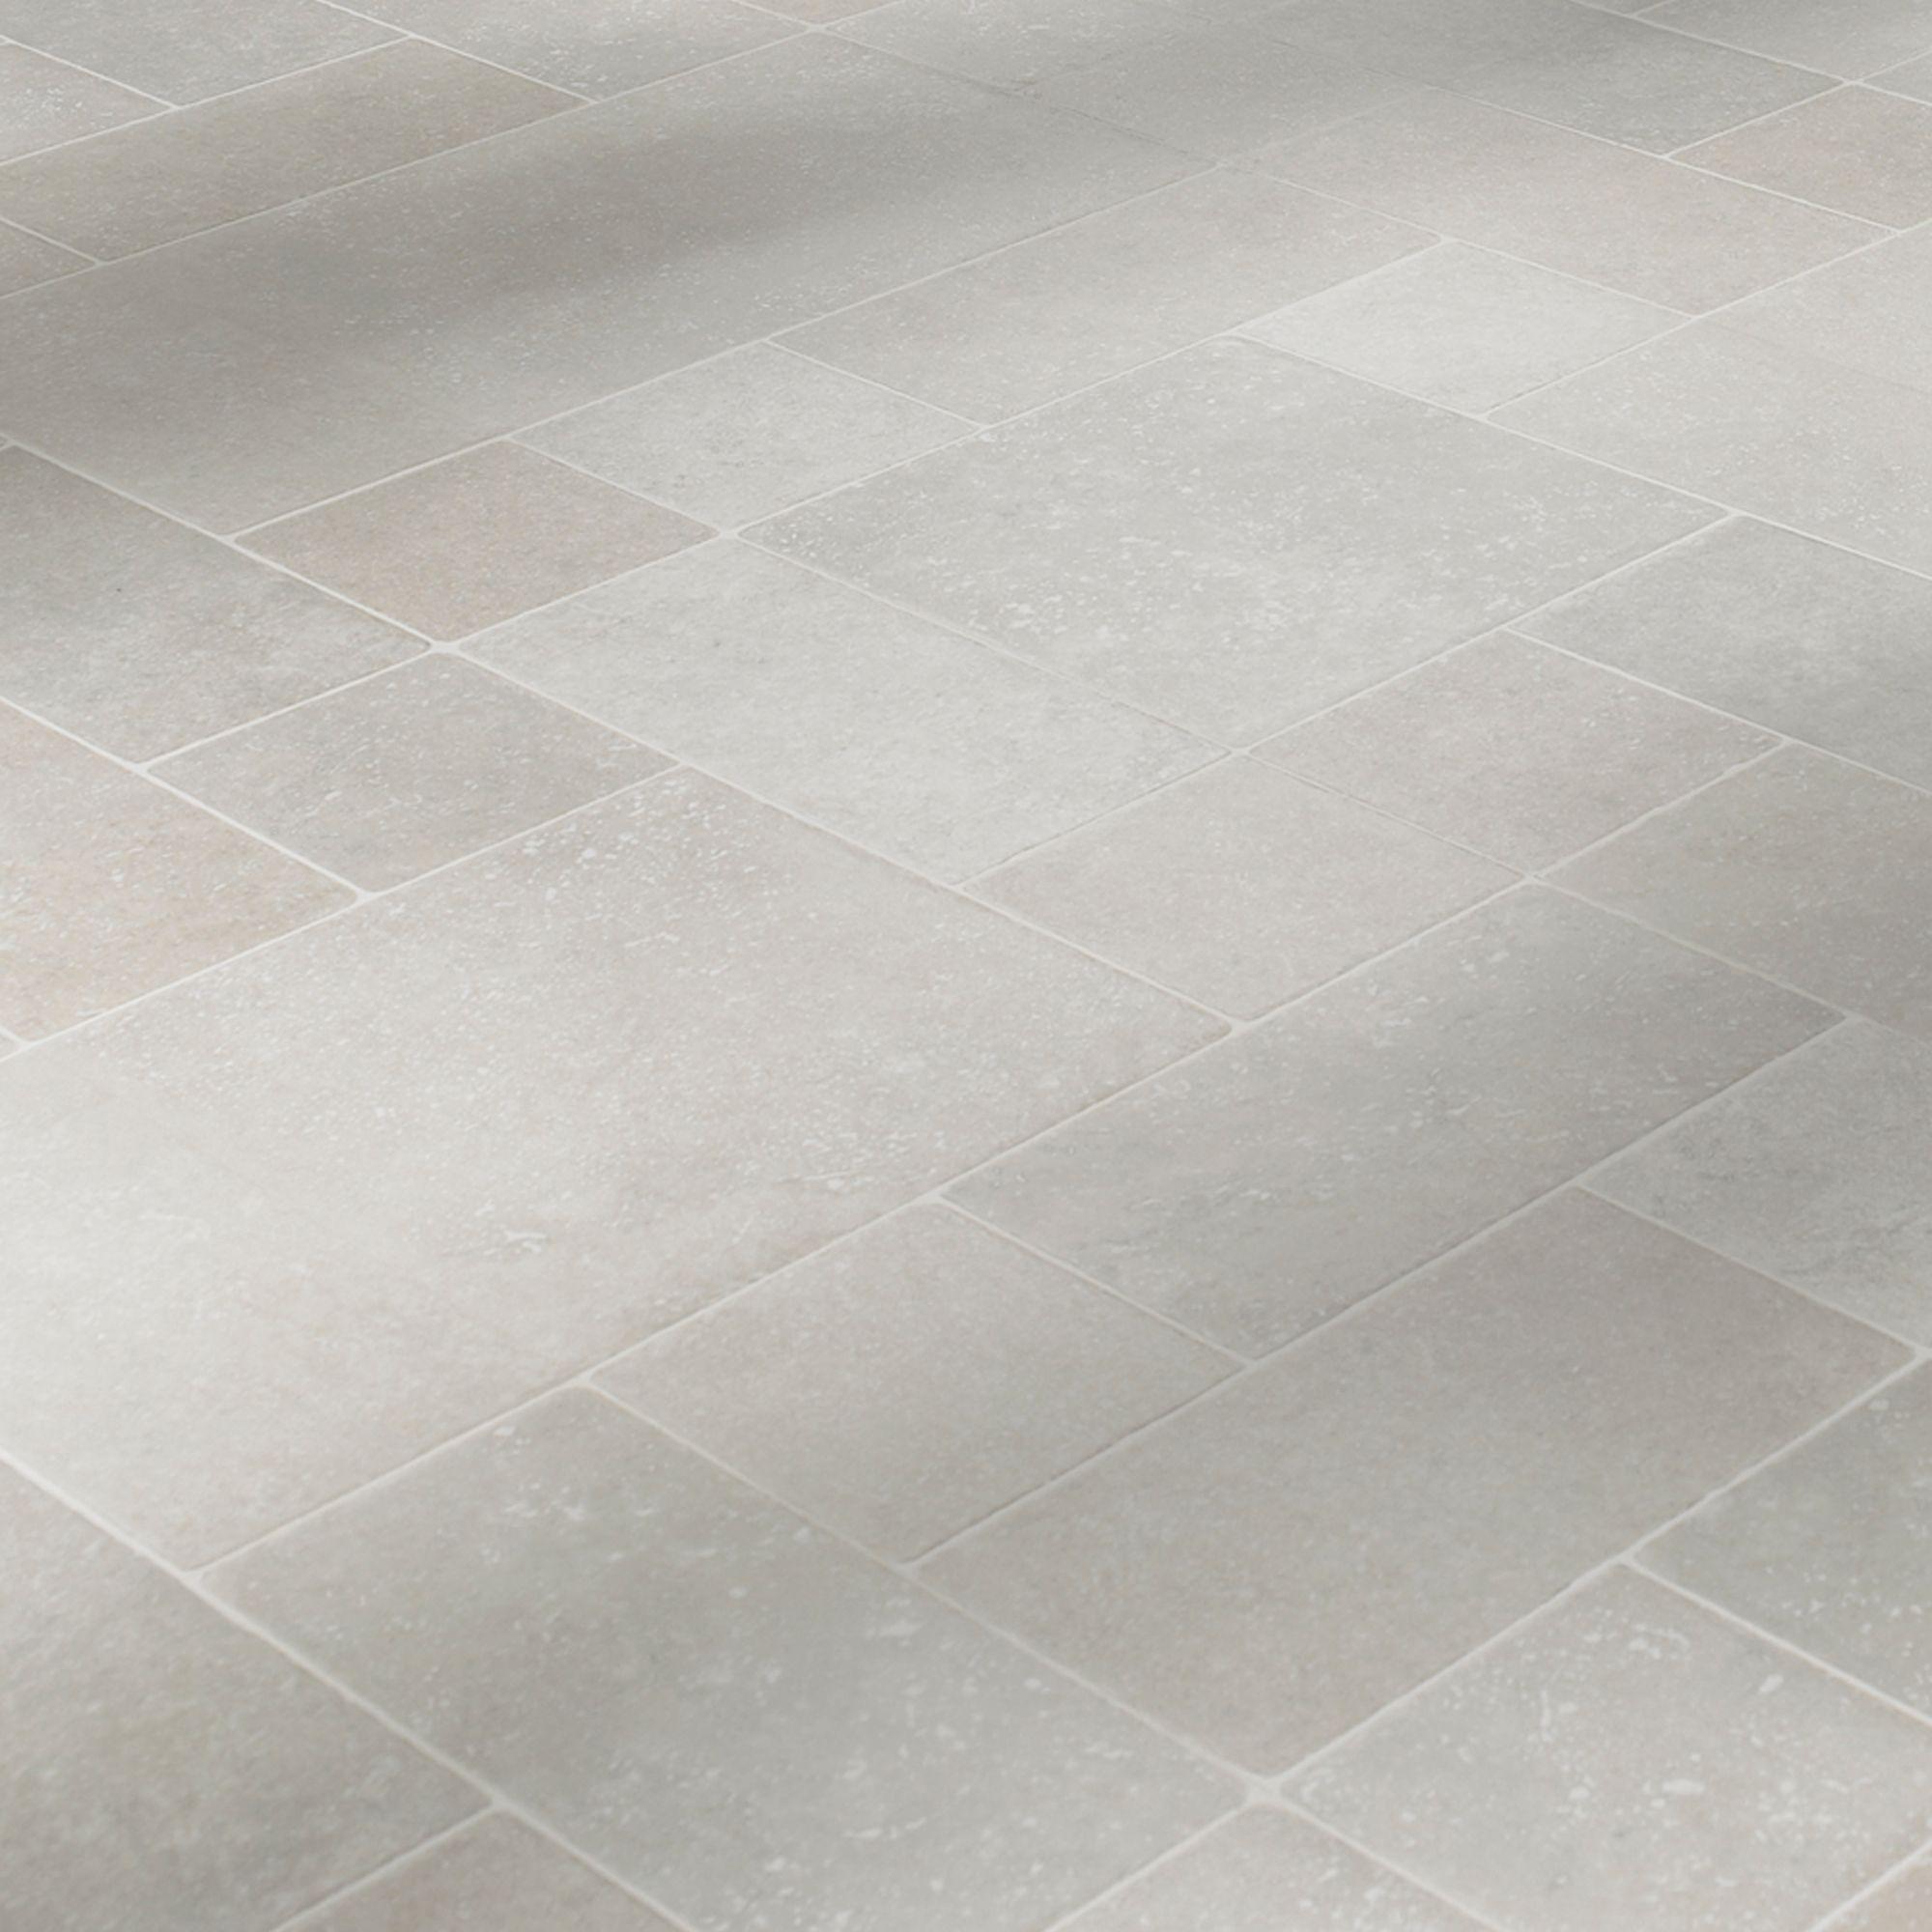 Barbarita Random Limestone Tile Effect Laminate Flooring for size 2000 X 2000